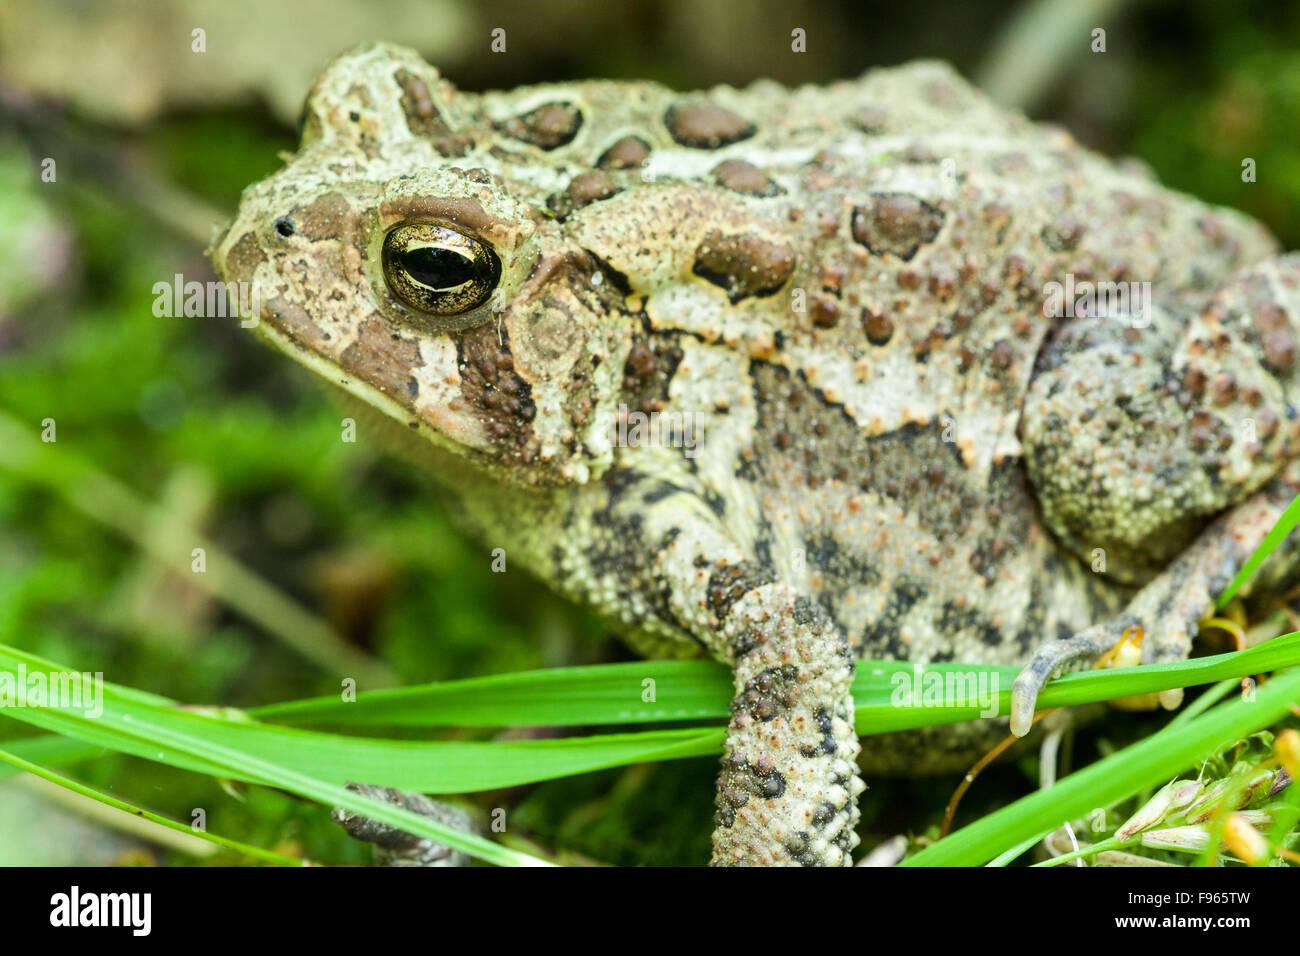 American Toad (Anaxyrus americanus), Bon Echo Provincial Park, Ontario, Canada - Stock Image